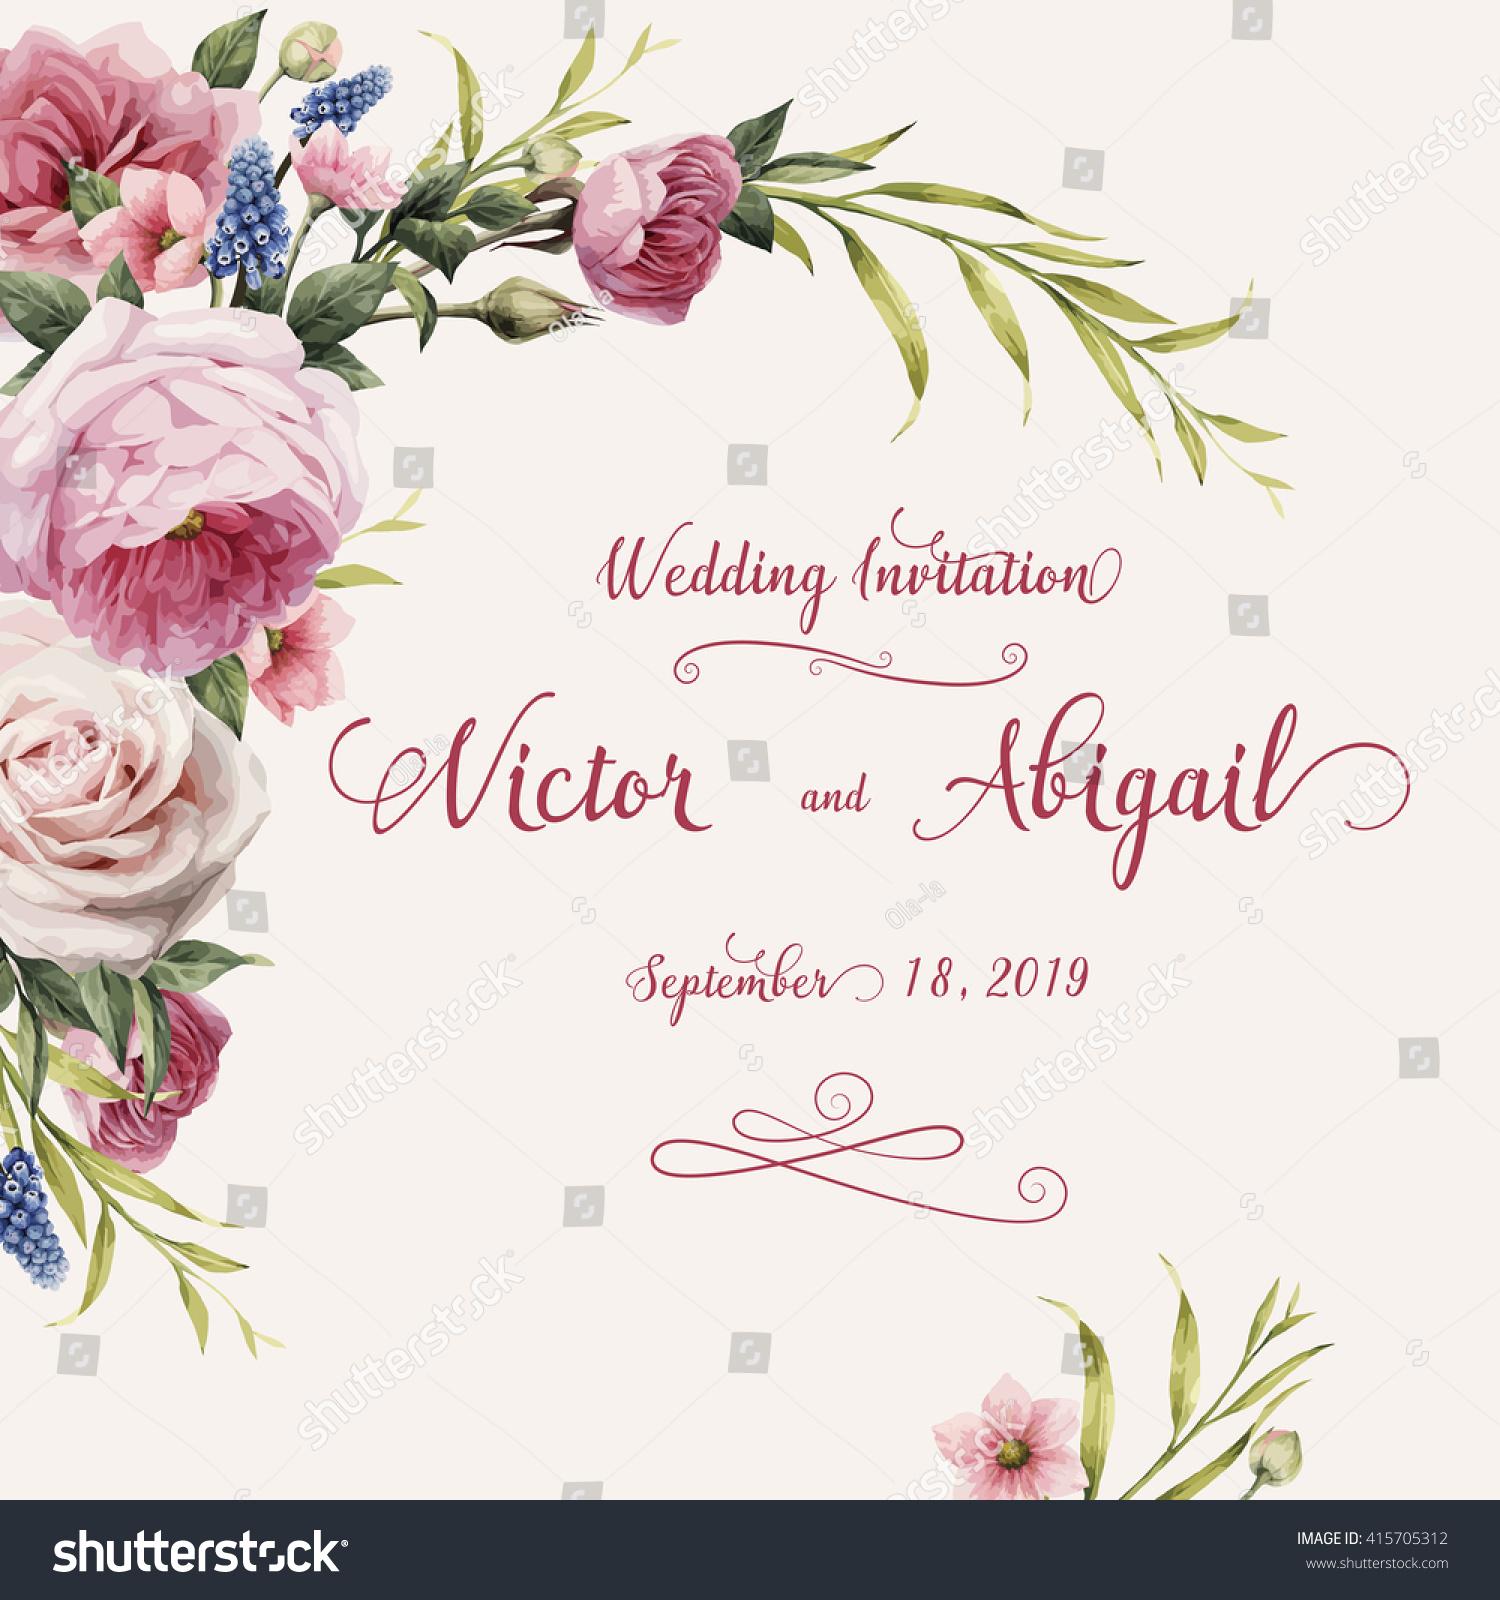 Similar Images Stock Photos Vectors Of Greeting Card Roses